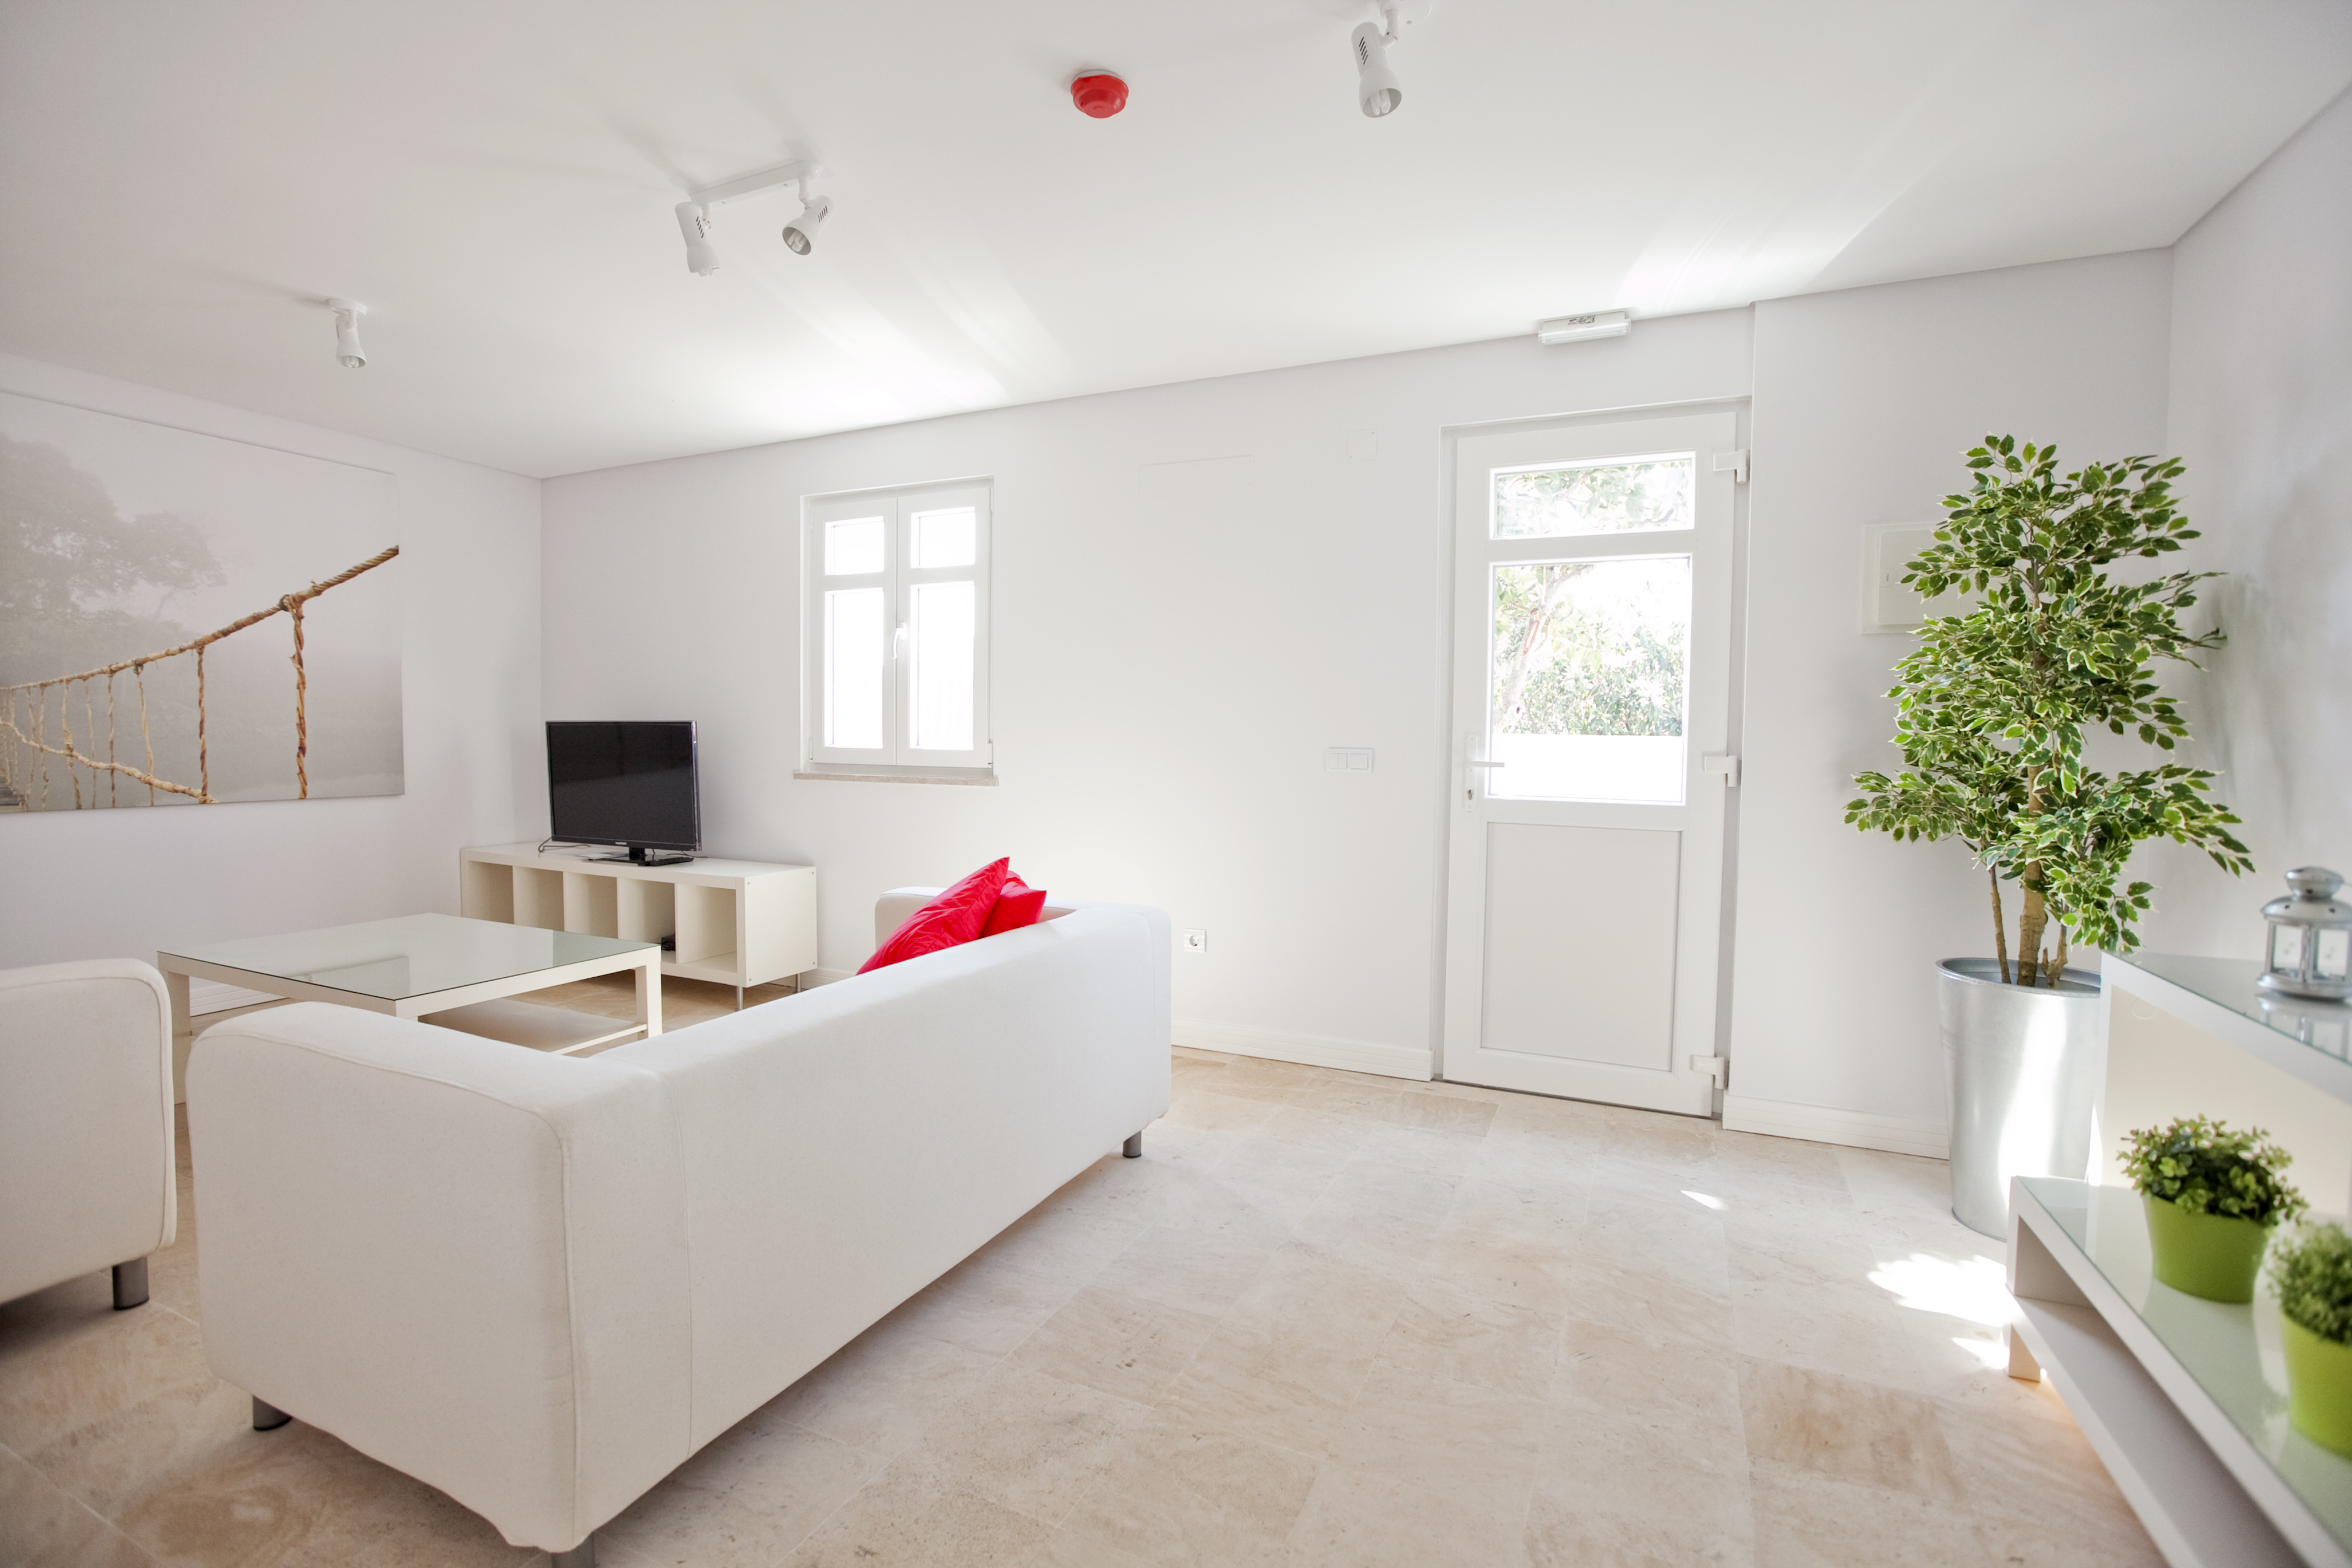 TE - Sala.Living  & Tv Room - Foto 2.JPG